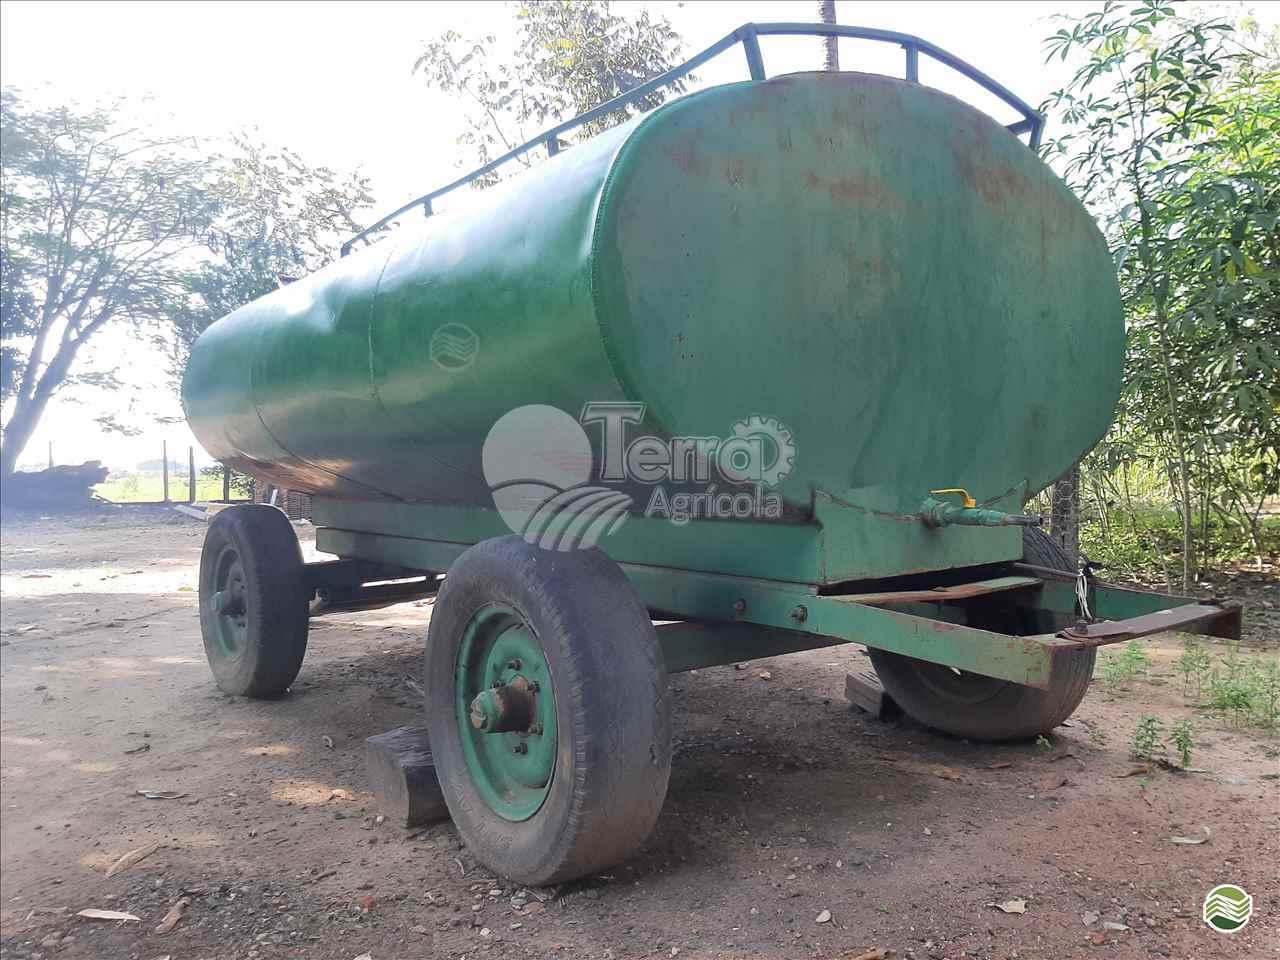 IMPLEMENTOS AGRICOLAS TANQUE ESTACIONÁRIO TANQUE Terra Agrícola DIAMANTINO MATO GROSSO MT